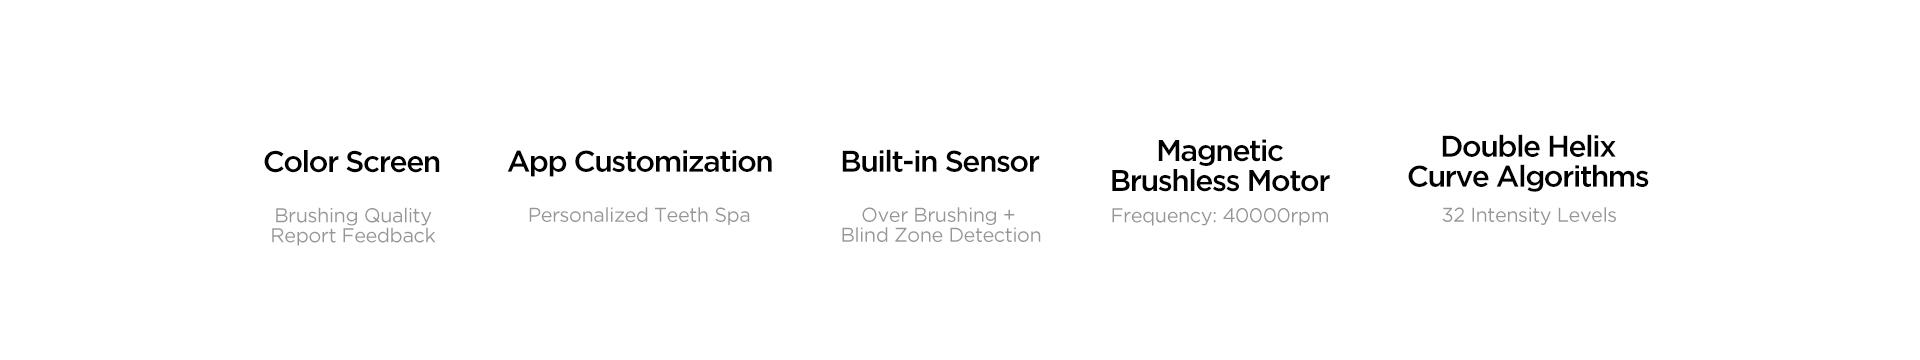 color screen app customization bulit-in sendor